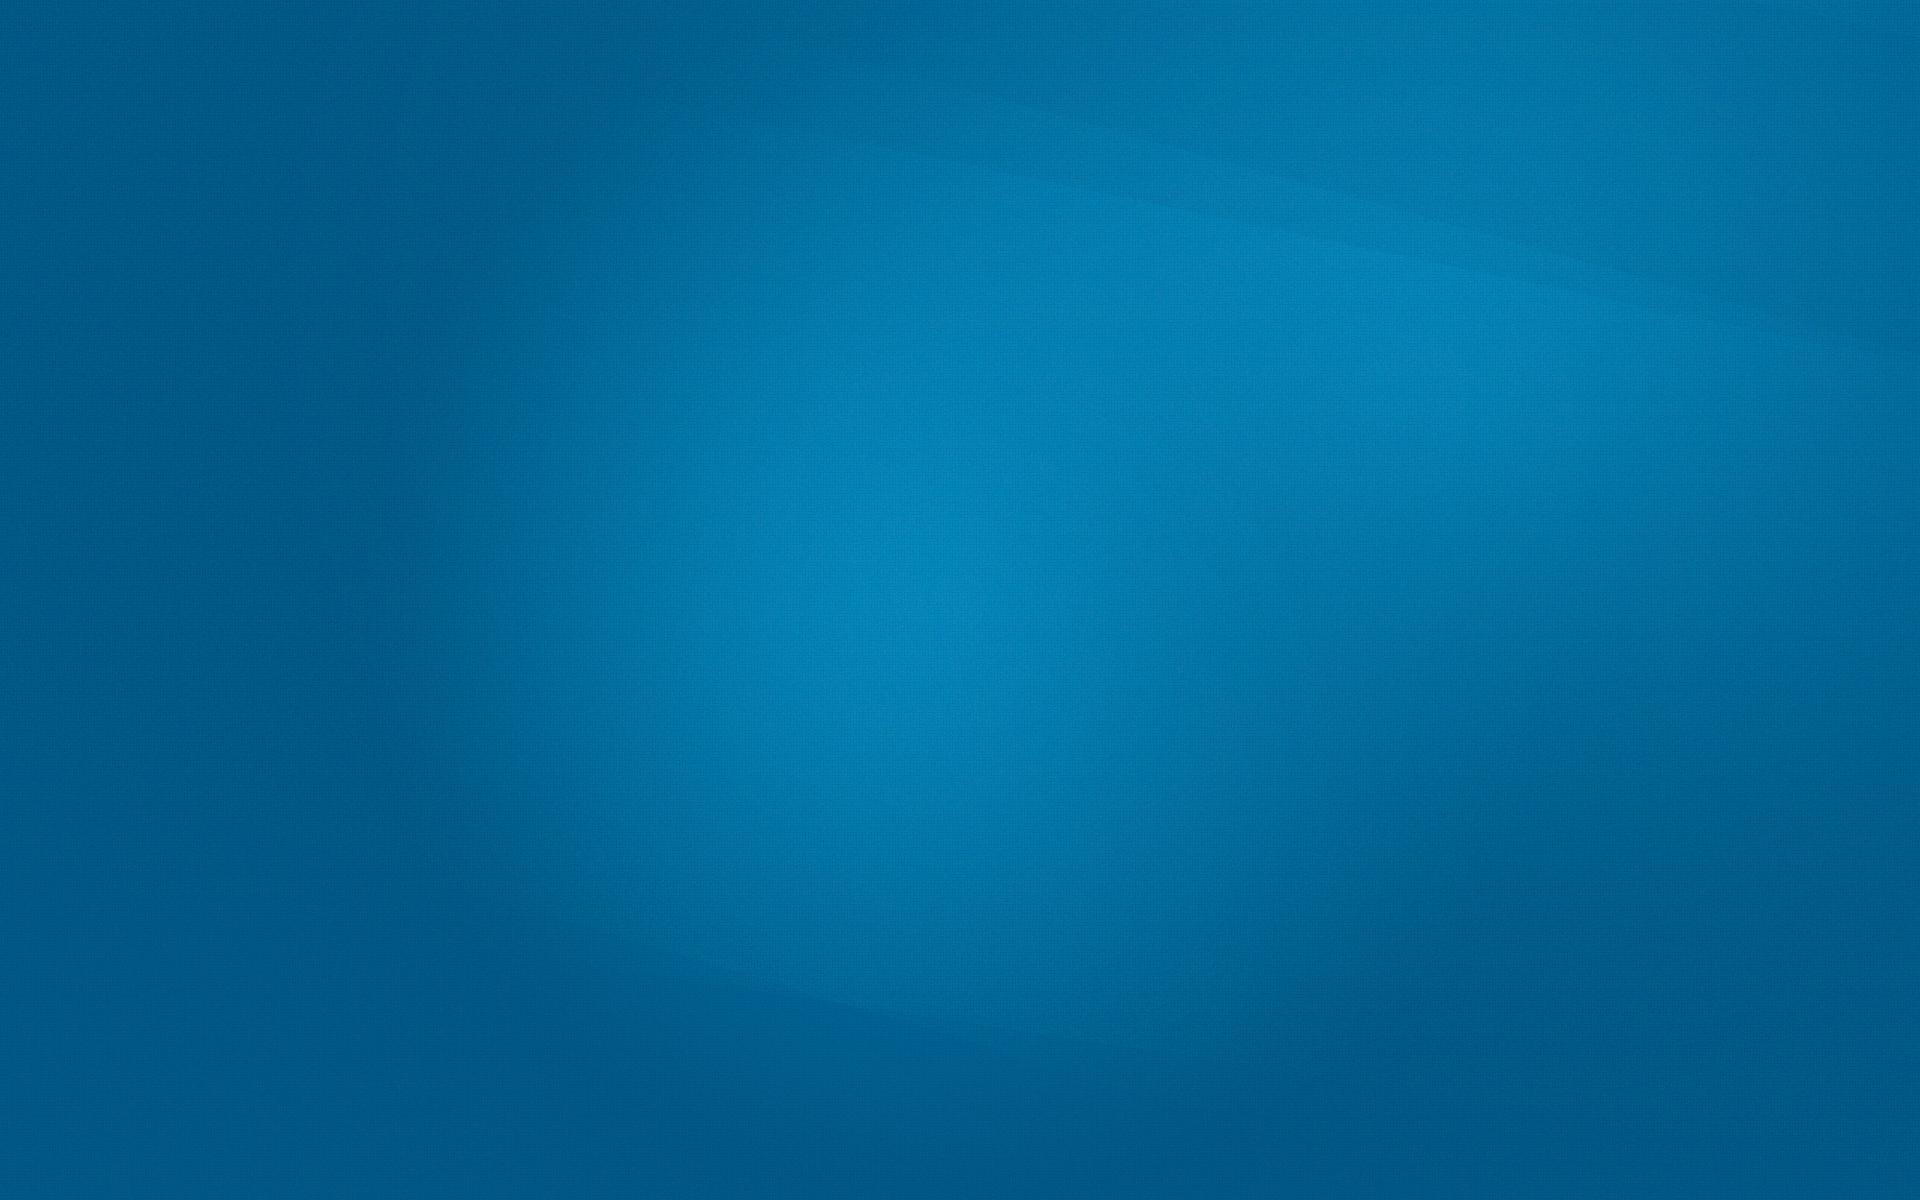 Clean wallpaper   143097 1920x1200